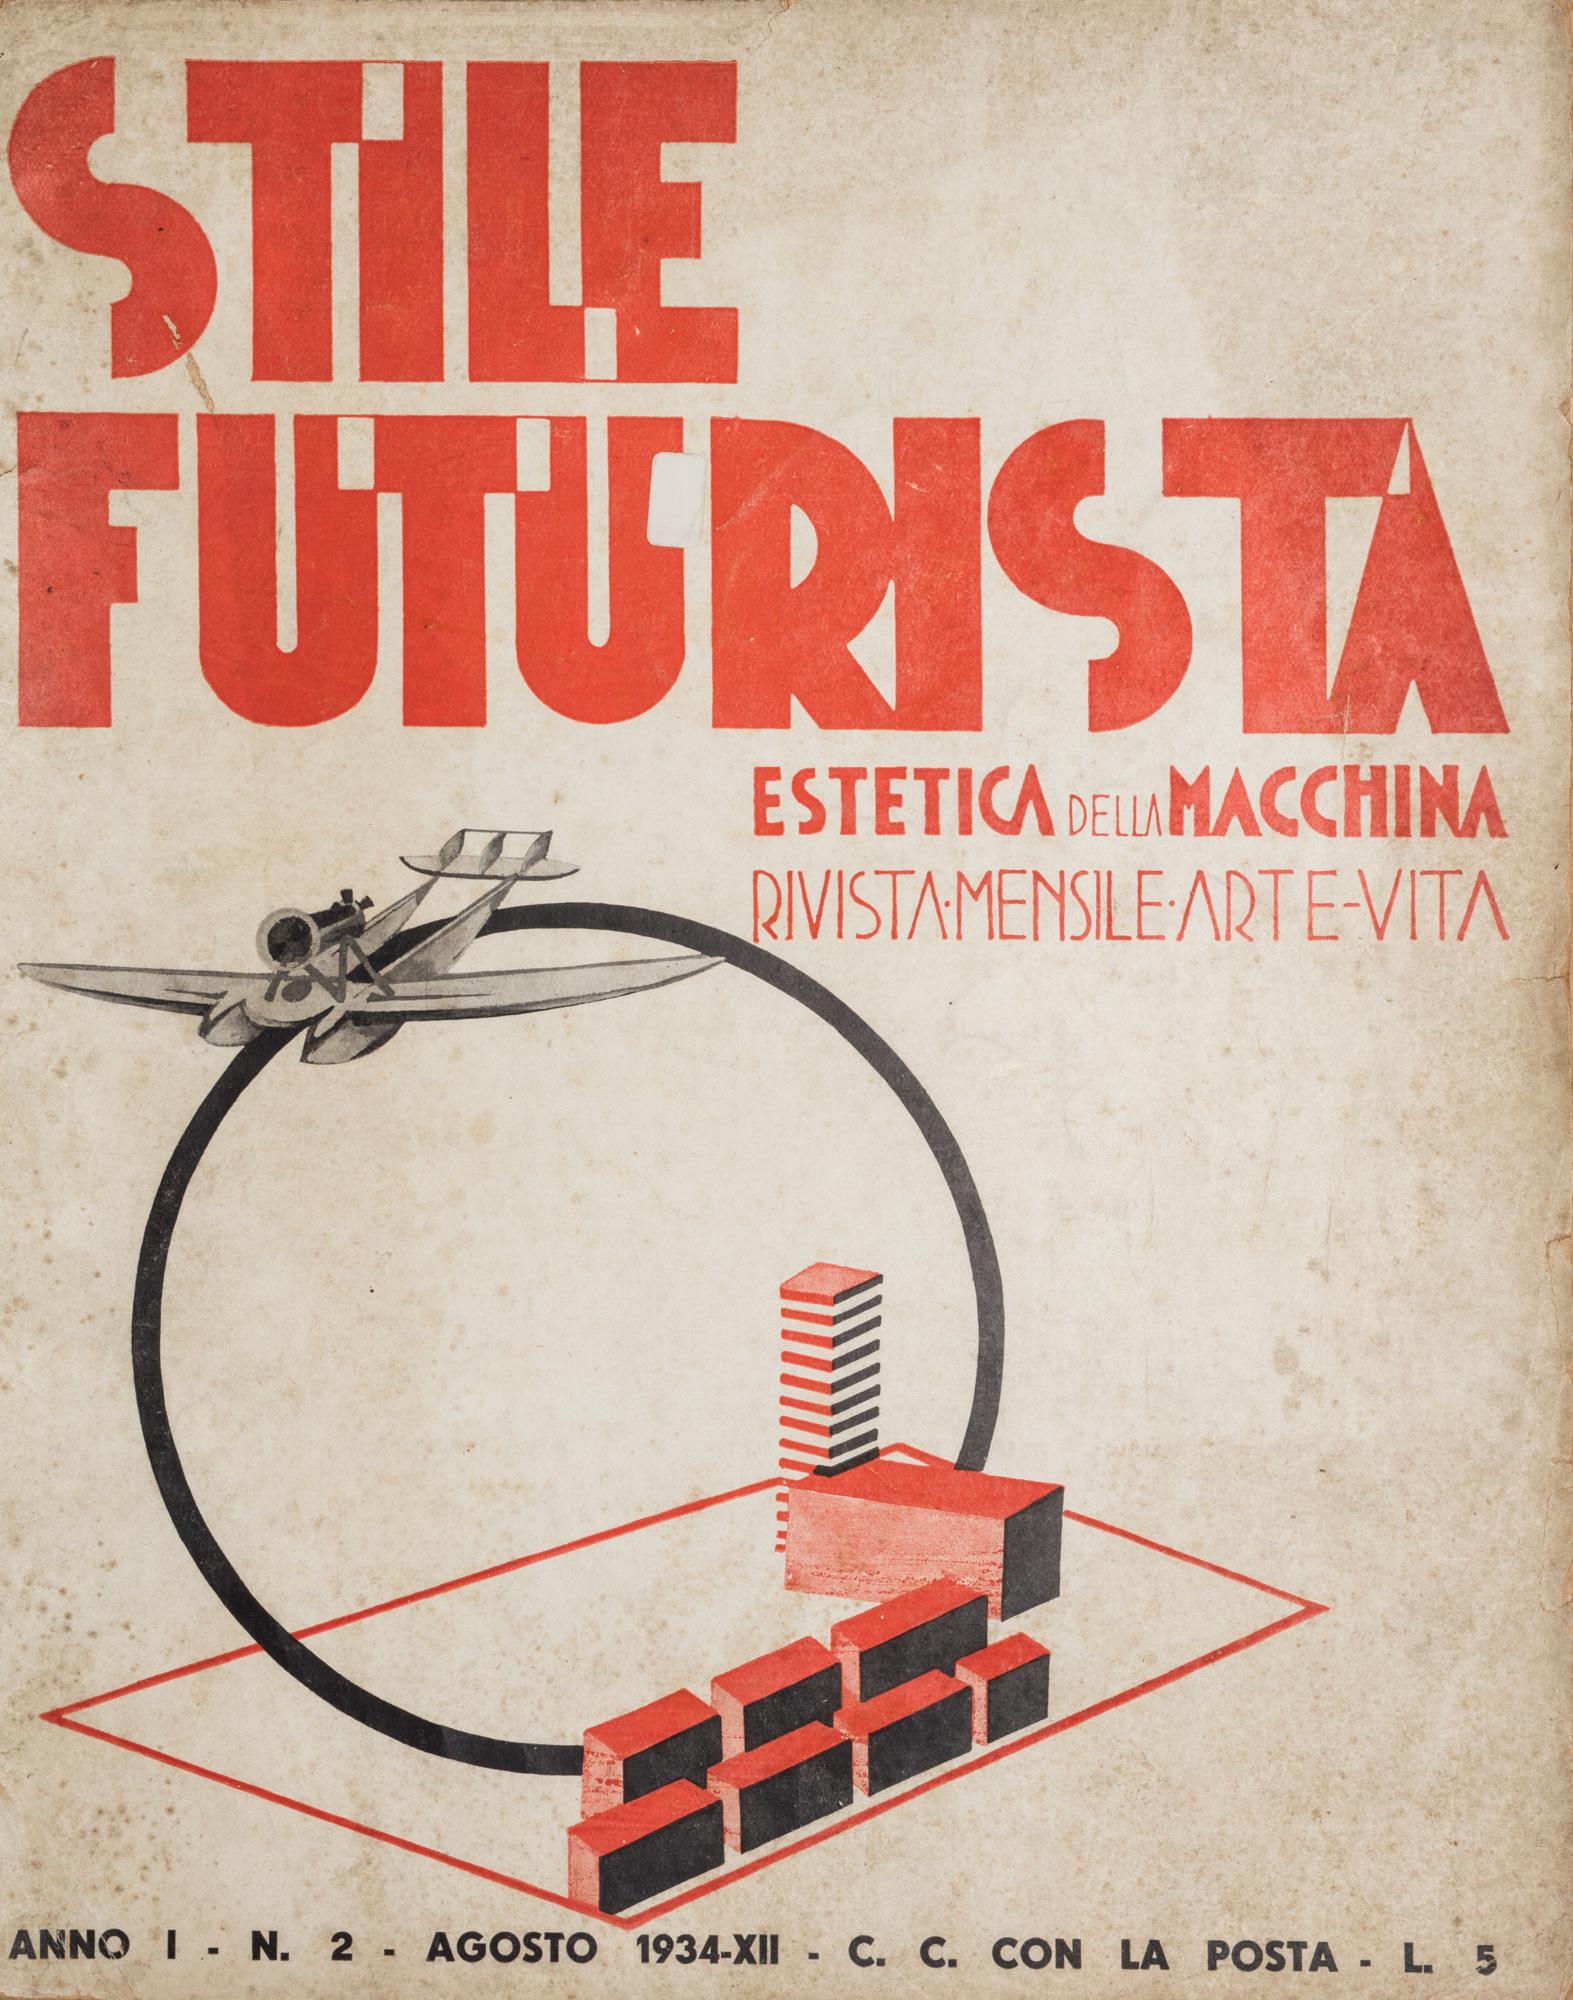 Stile futurista. Rivista mensile d'arte-vita